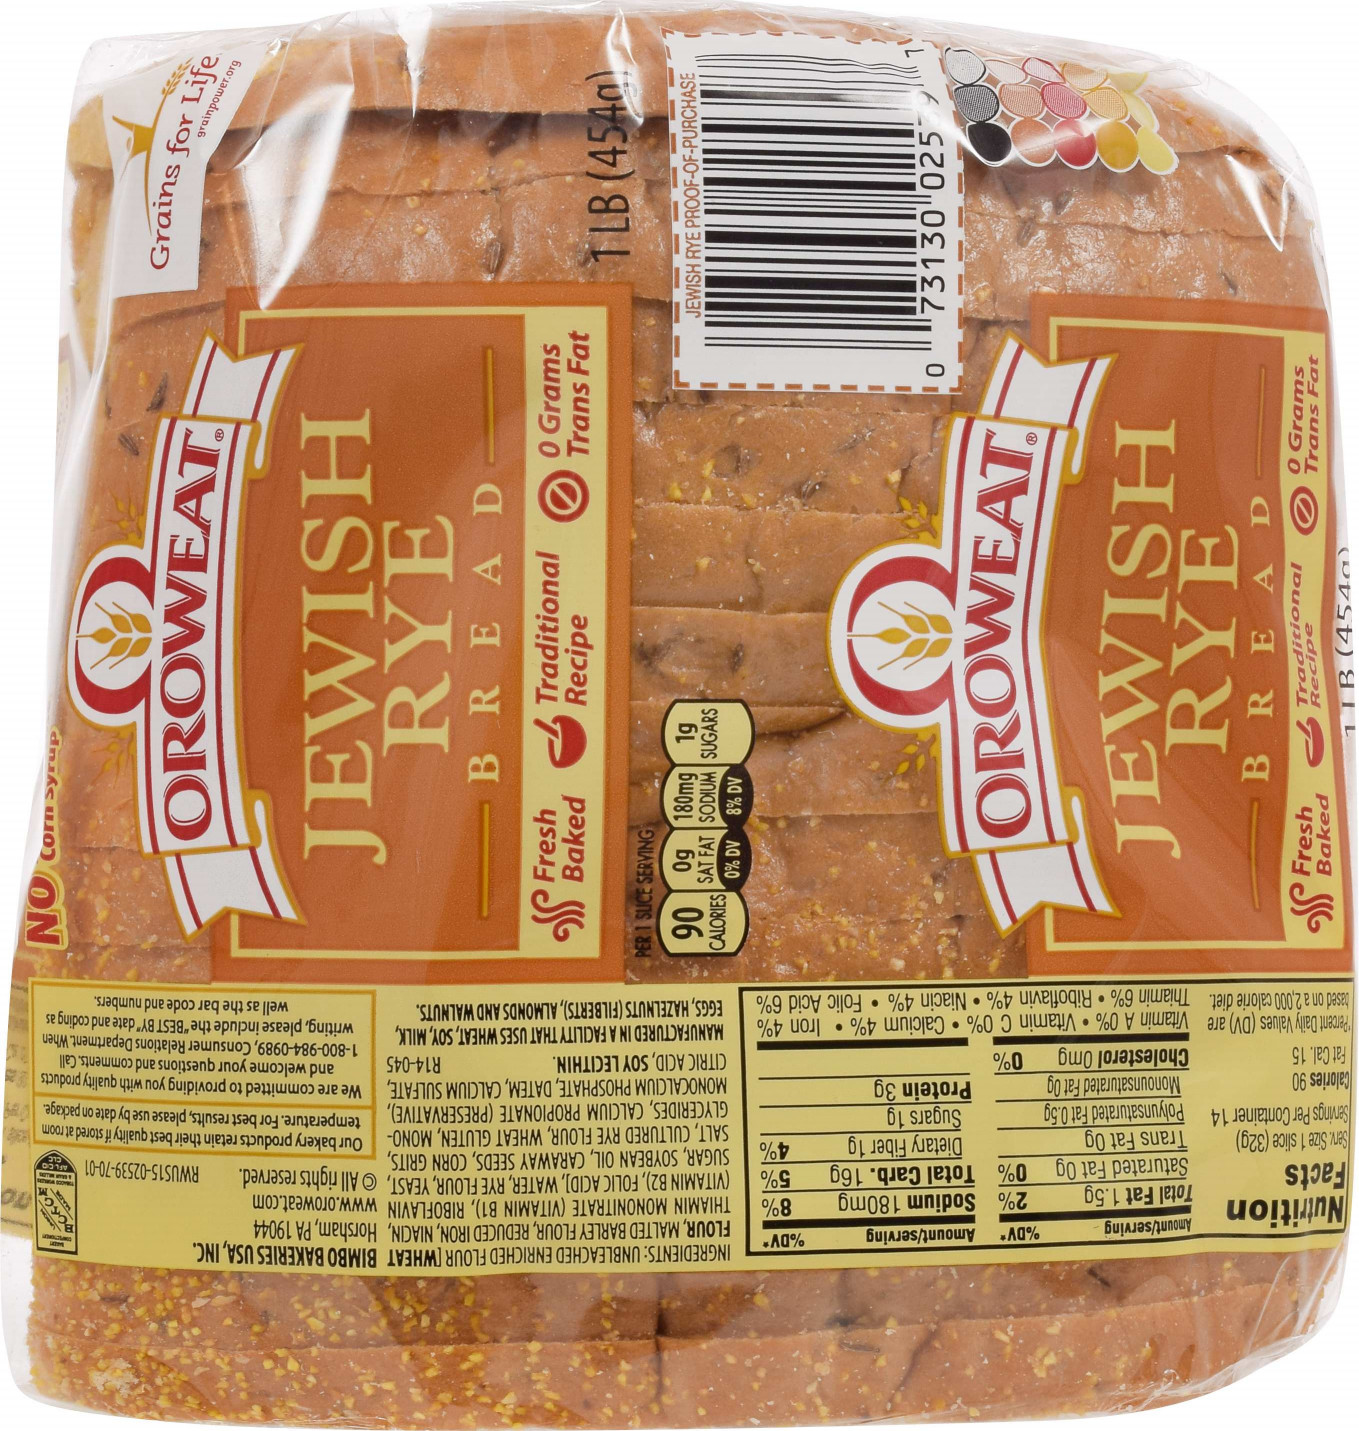 Oroweat Jewish Rye Bread 16 Oz